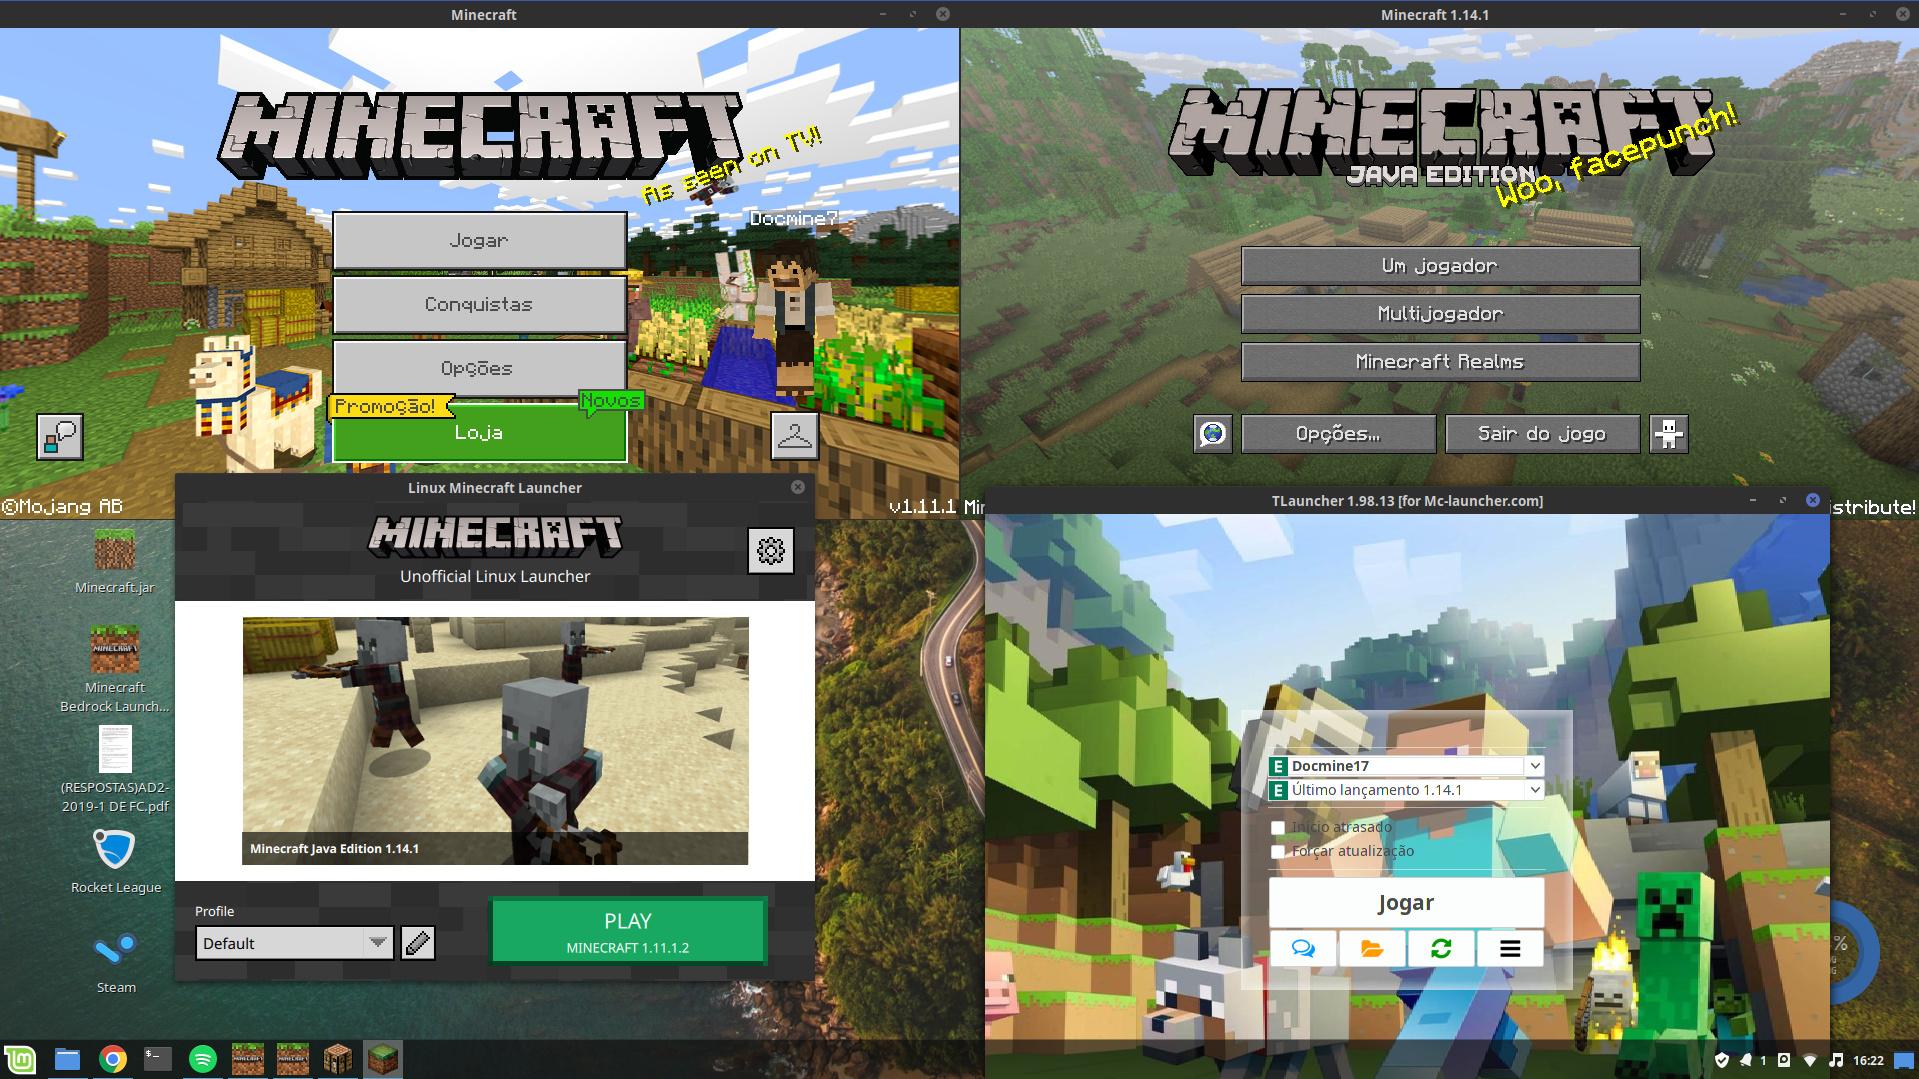 Minecraft Windows 8 Edition vs Minecraft Java Edition - games